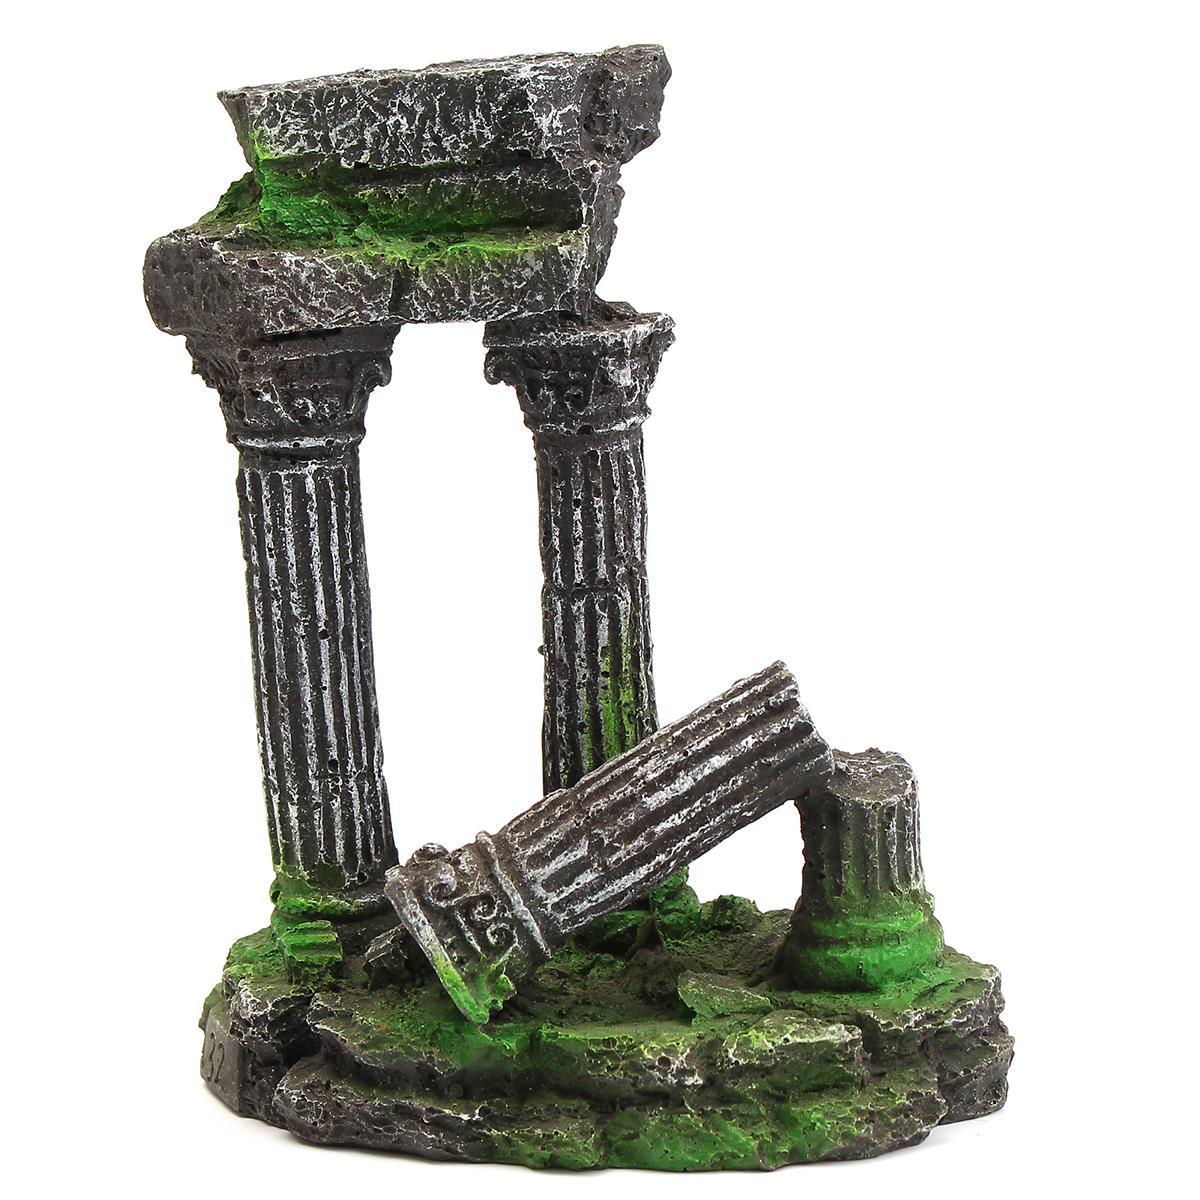 Resin Artificial Aquarium Roman Column Decoration Ancient Ruin Ornament Fish Tank Stone Cave Rock